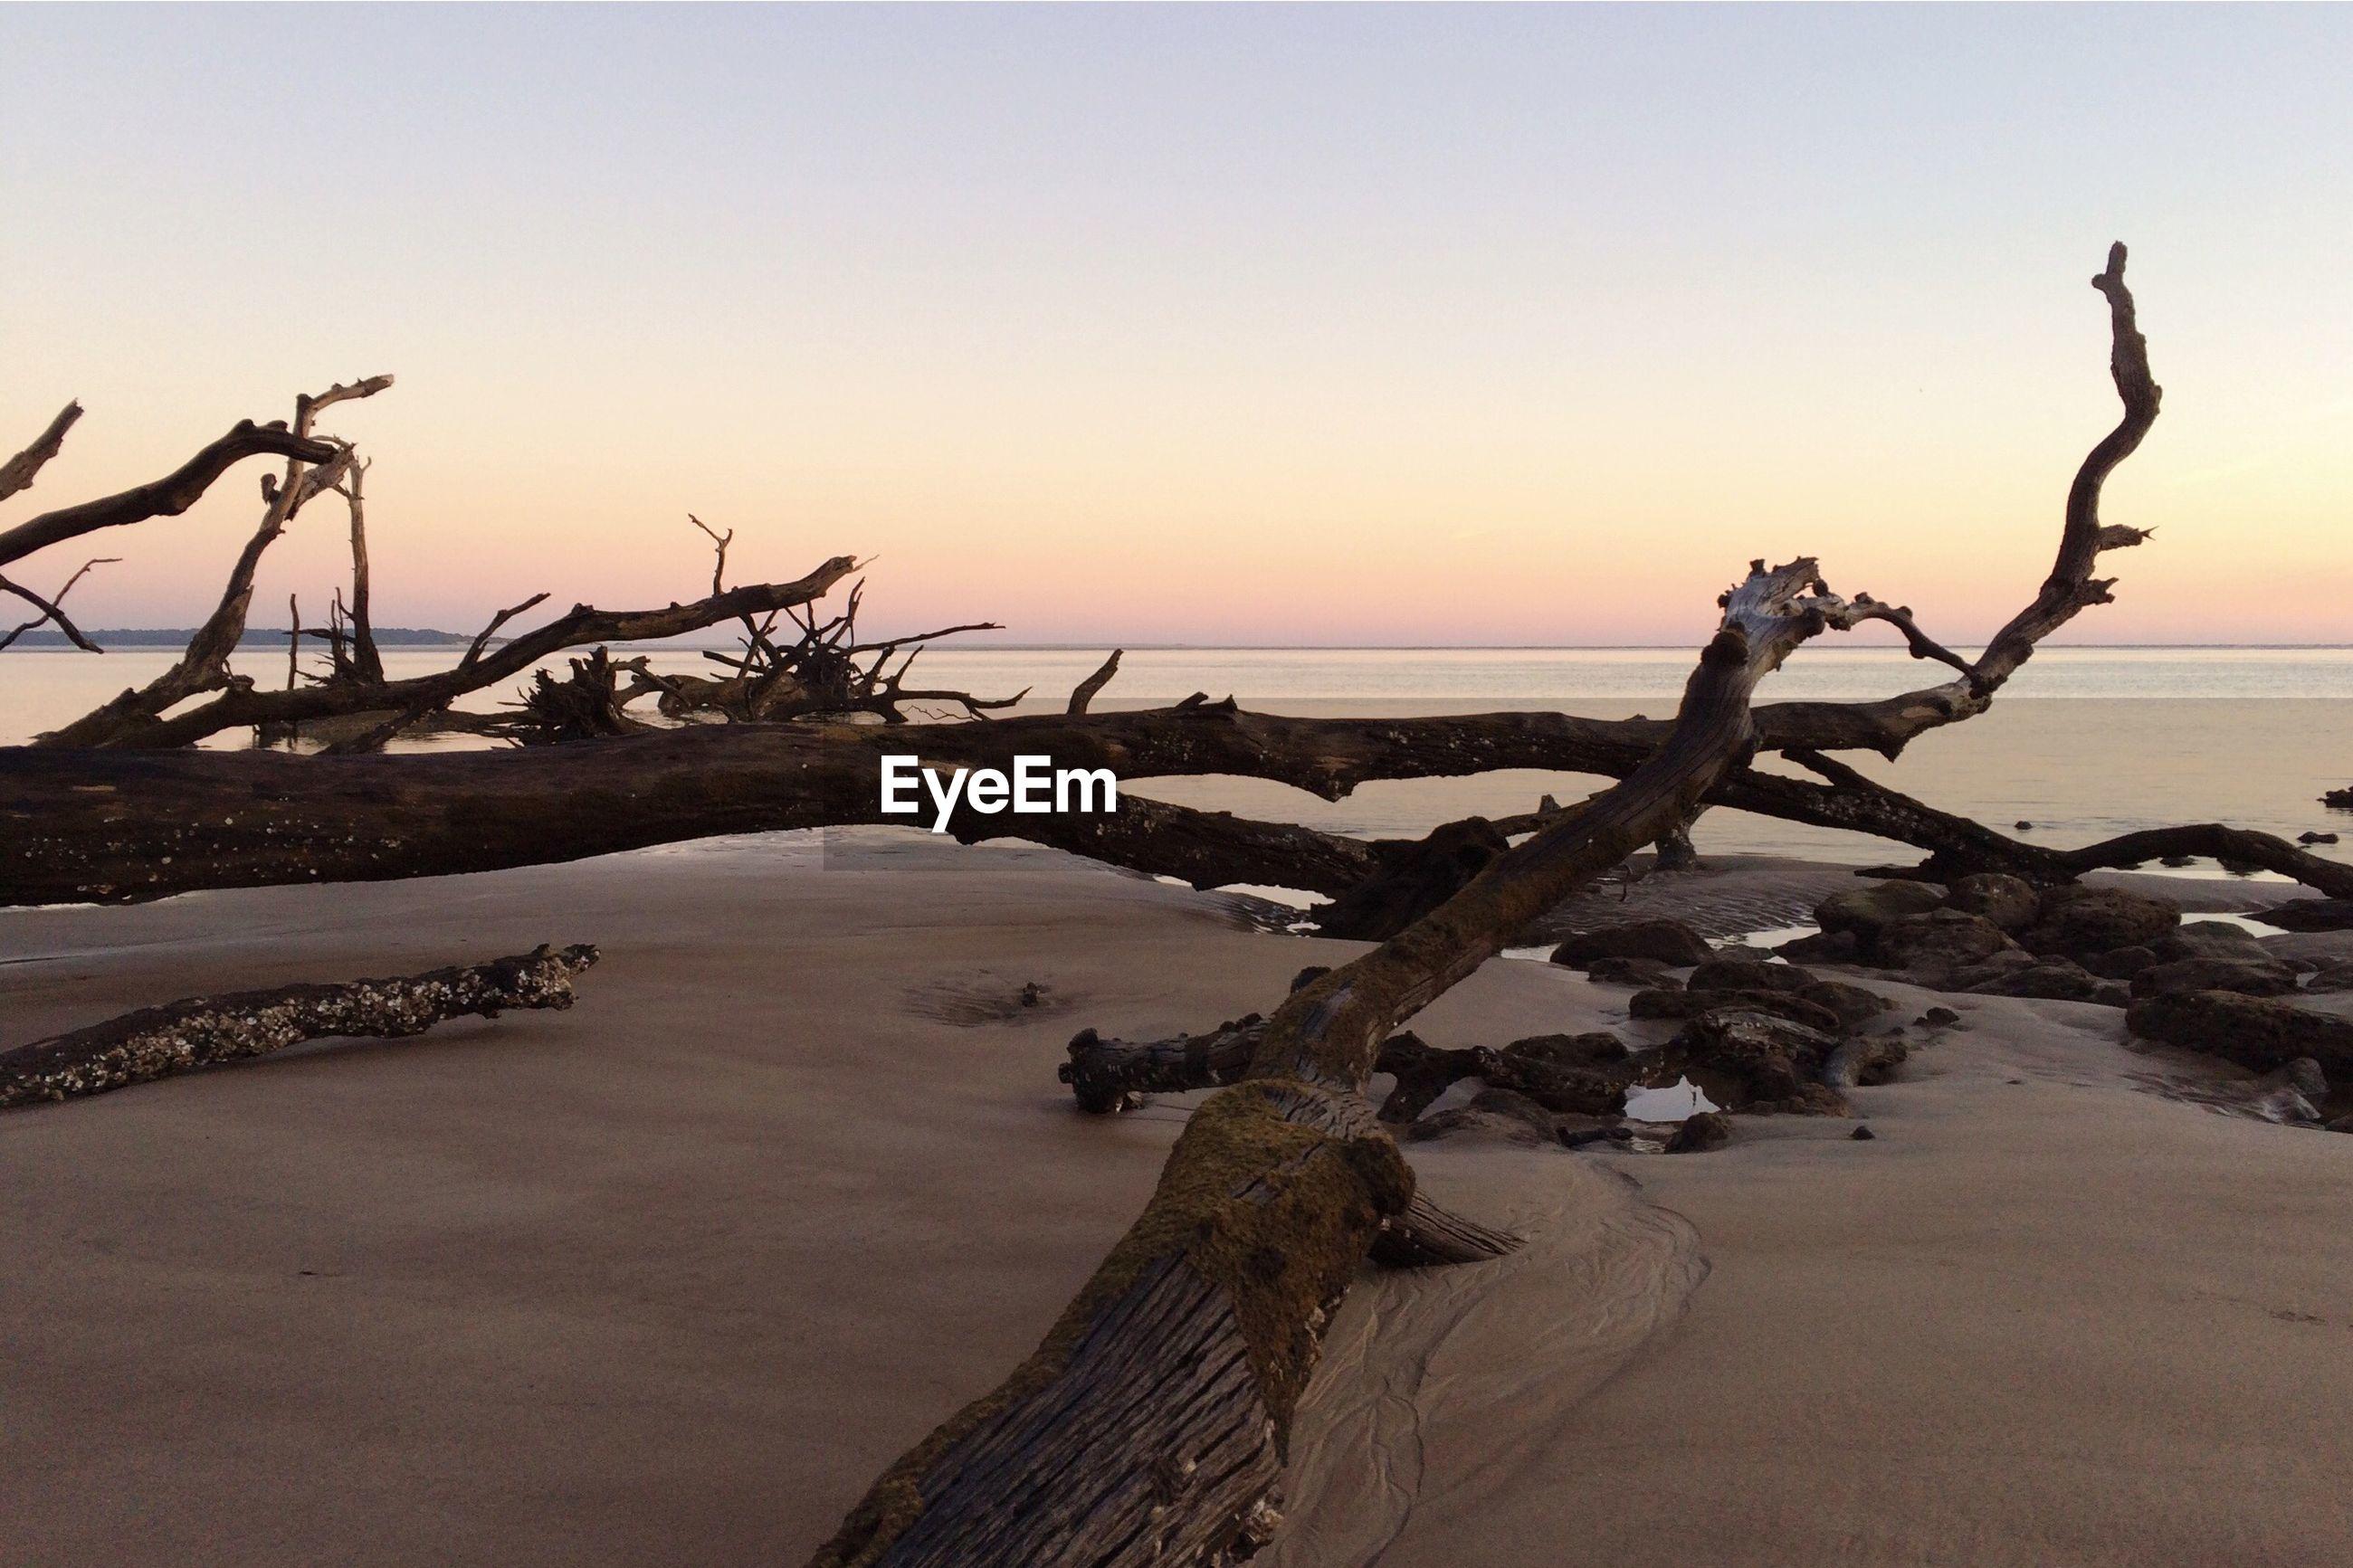 Driftwood on sandy beach